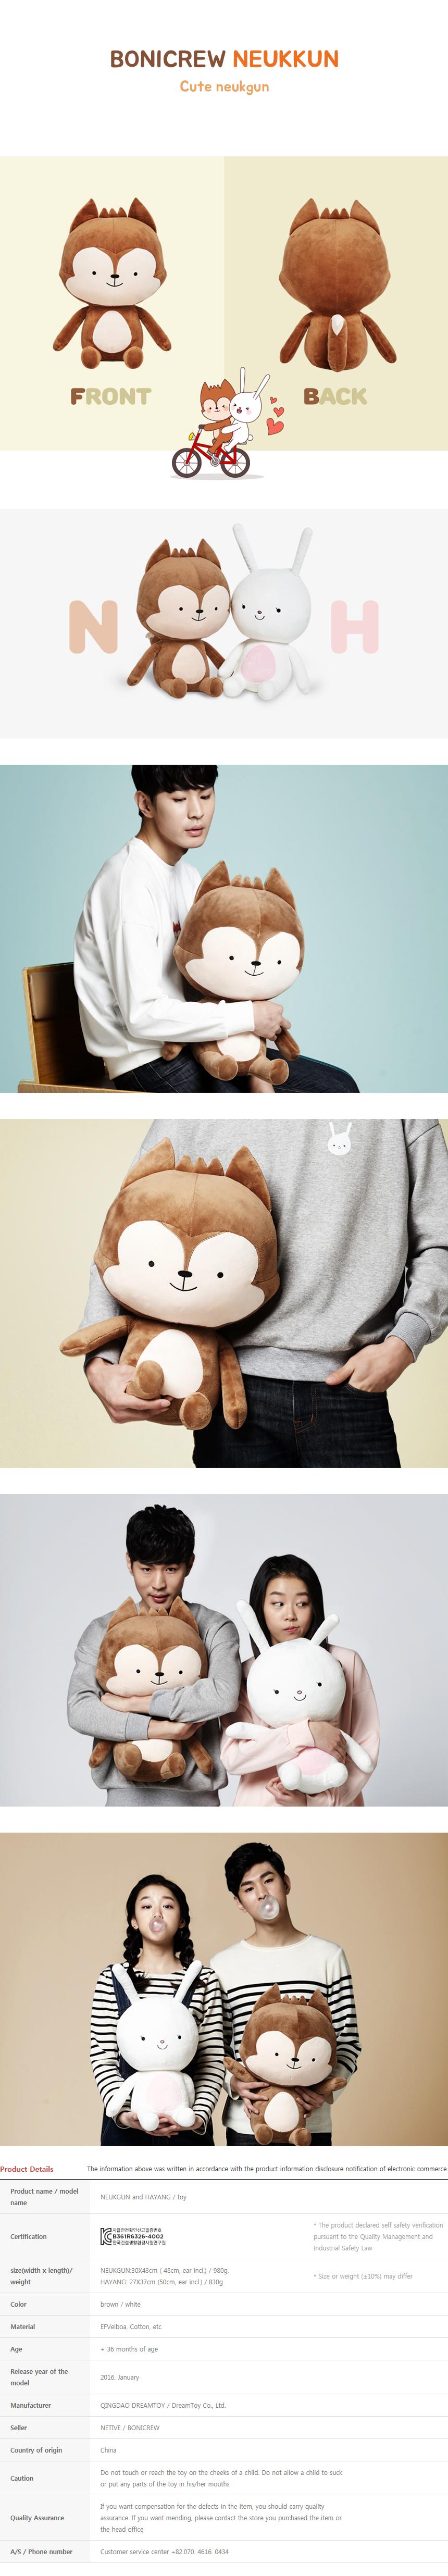 [ BONICREW ] 宋仲基同款 太阳的后裔 狼君娃娃 小猴子 NEUKKUN + 配套项目 (L)